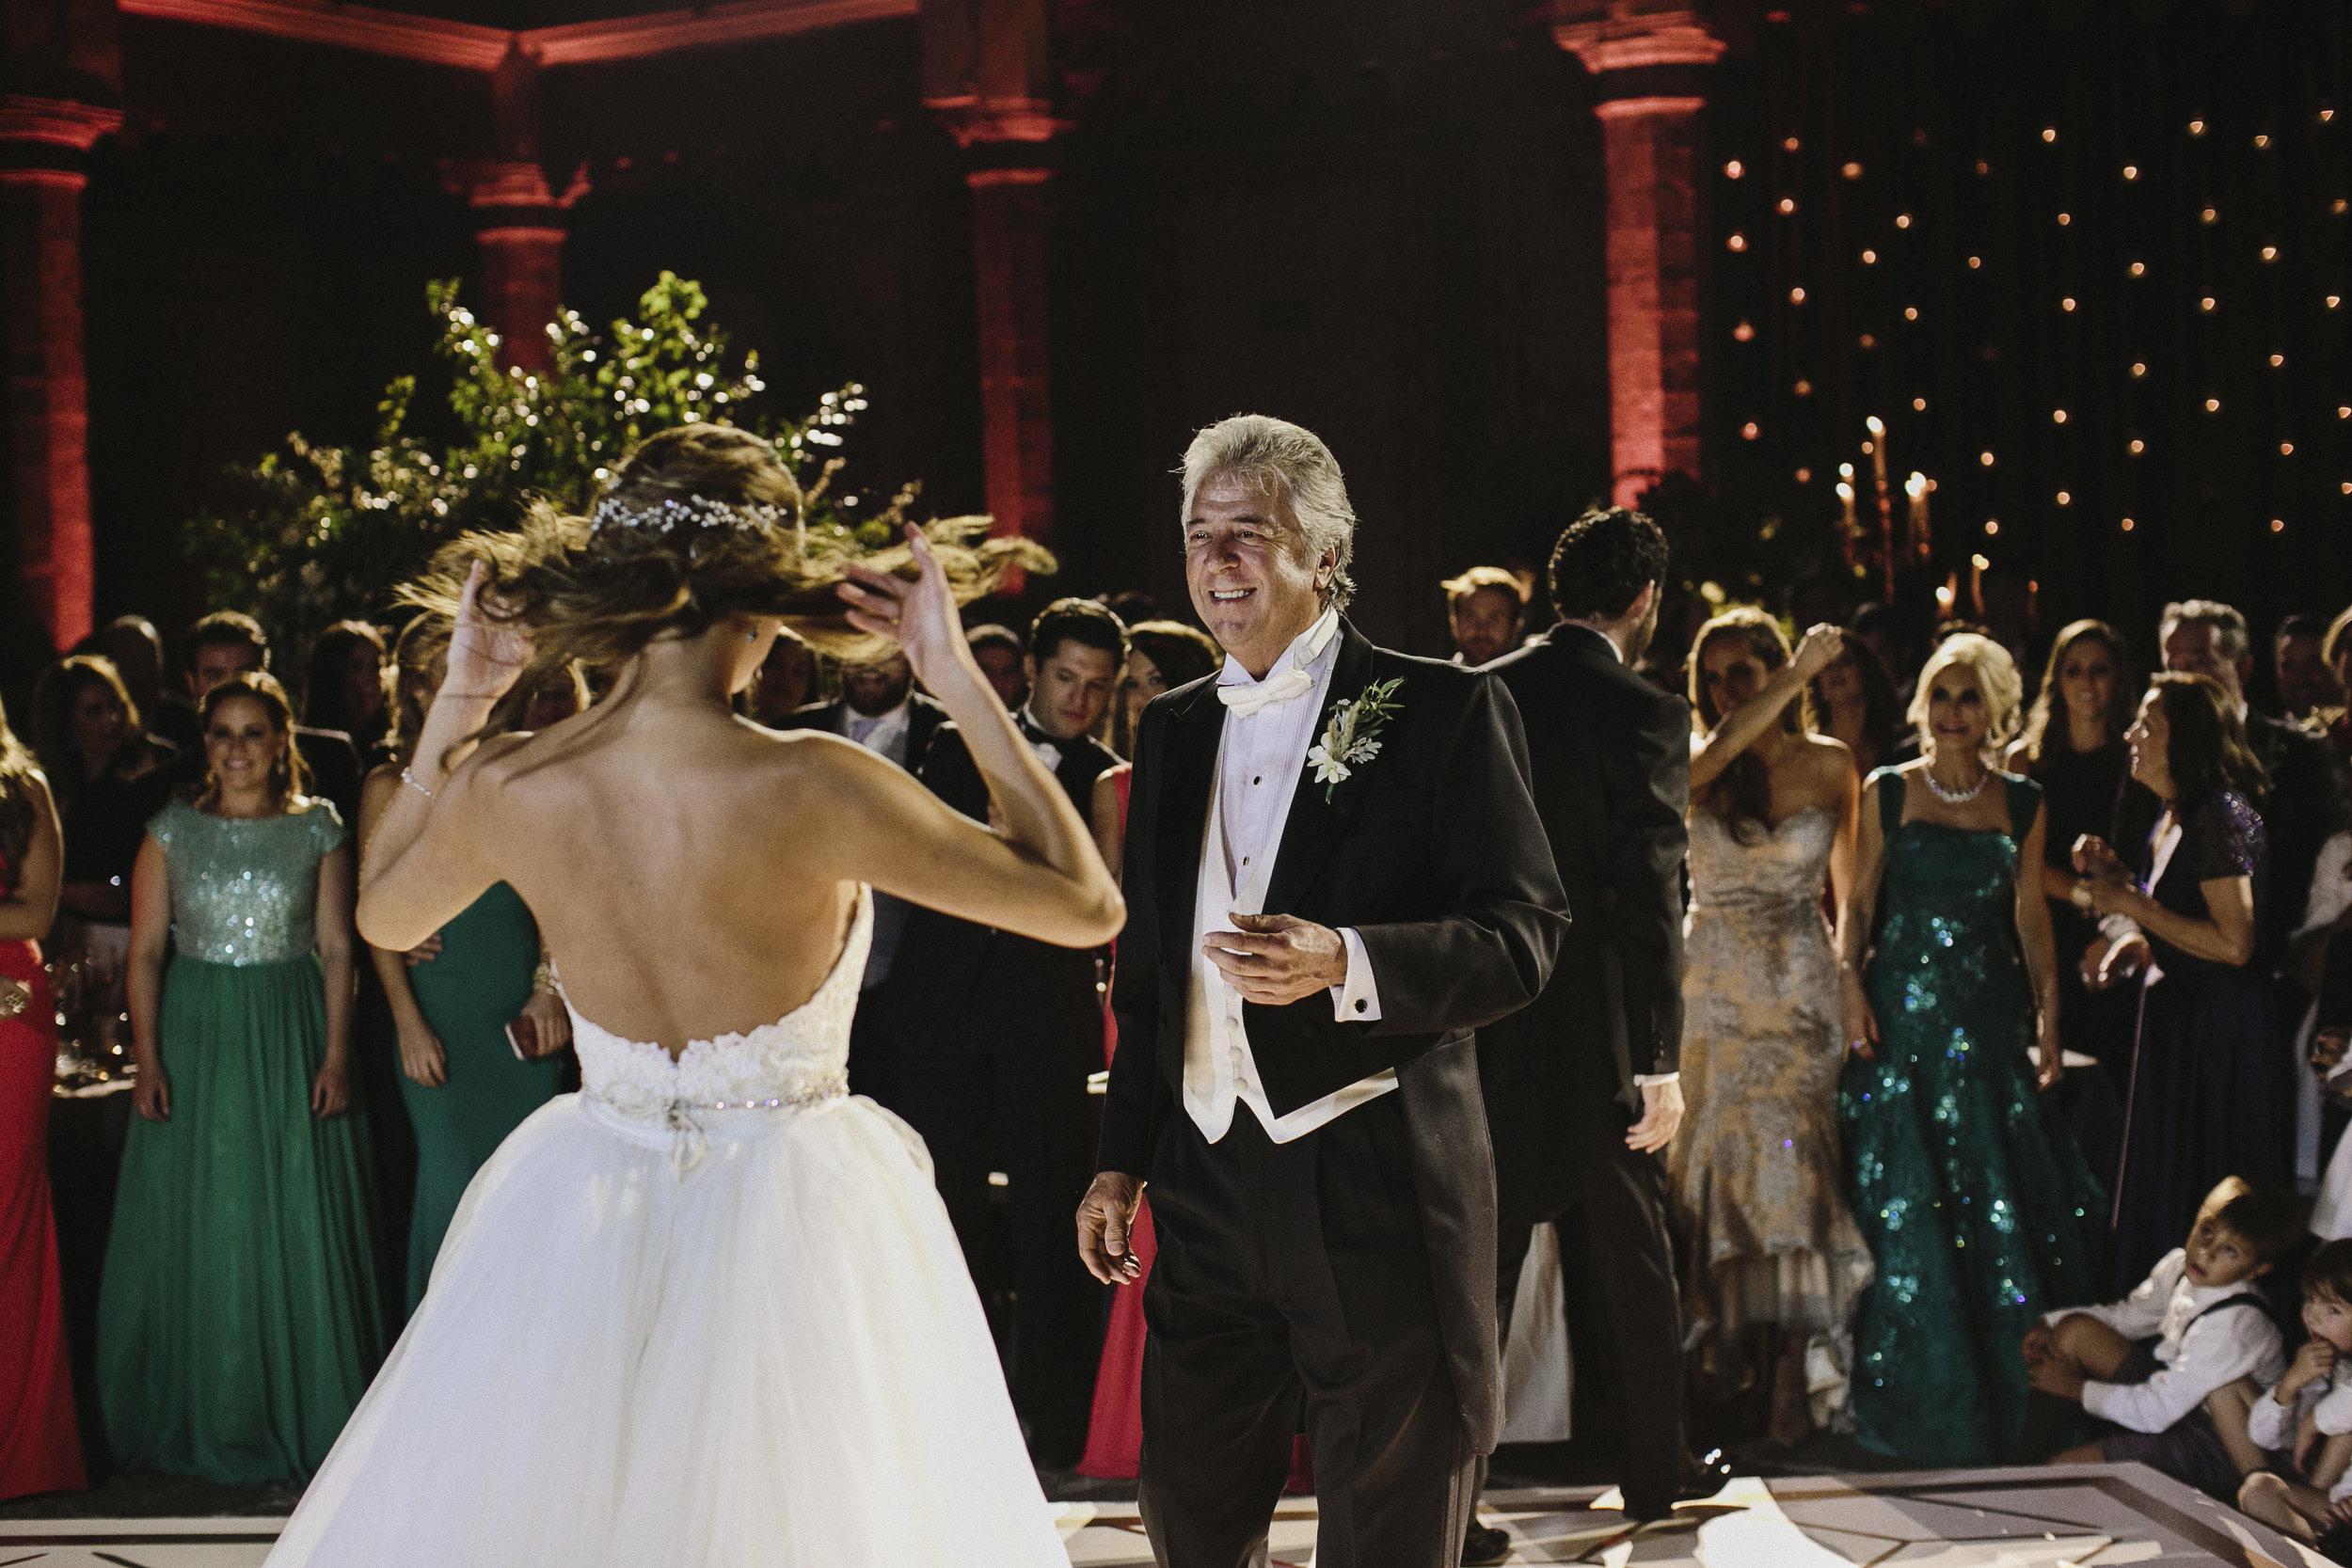 alfonso_flores_destination_wedding_photogrpahy_paola_alonso-989.JPG